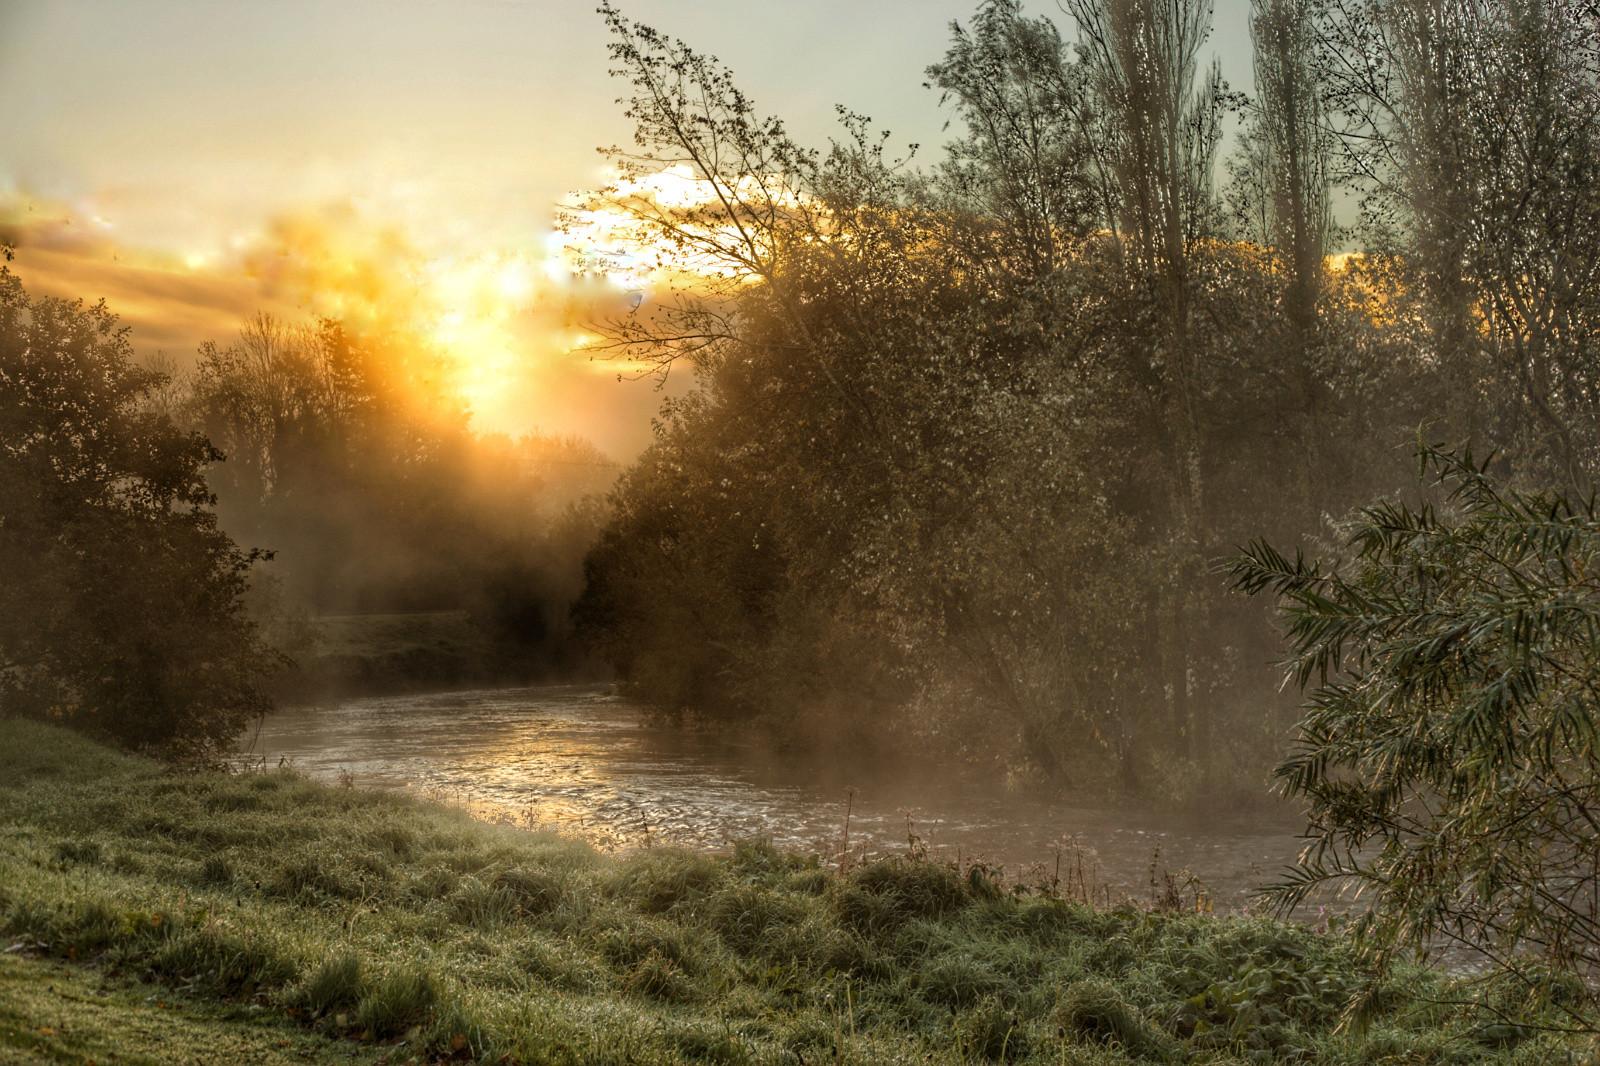 COLOUR - Morning Glory by Gary Cowan (9 marks)